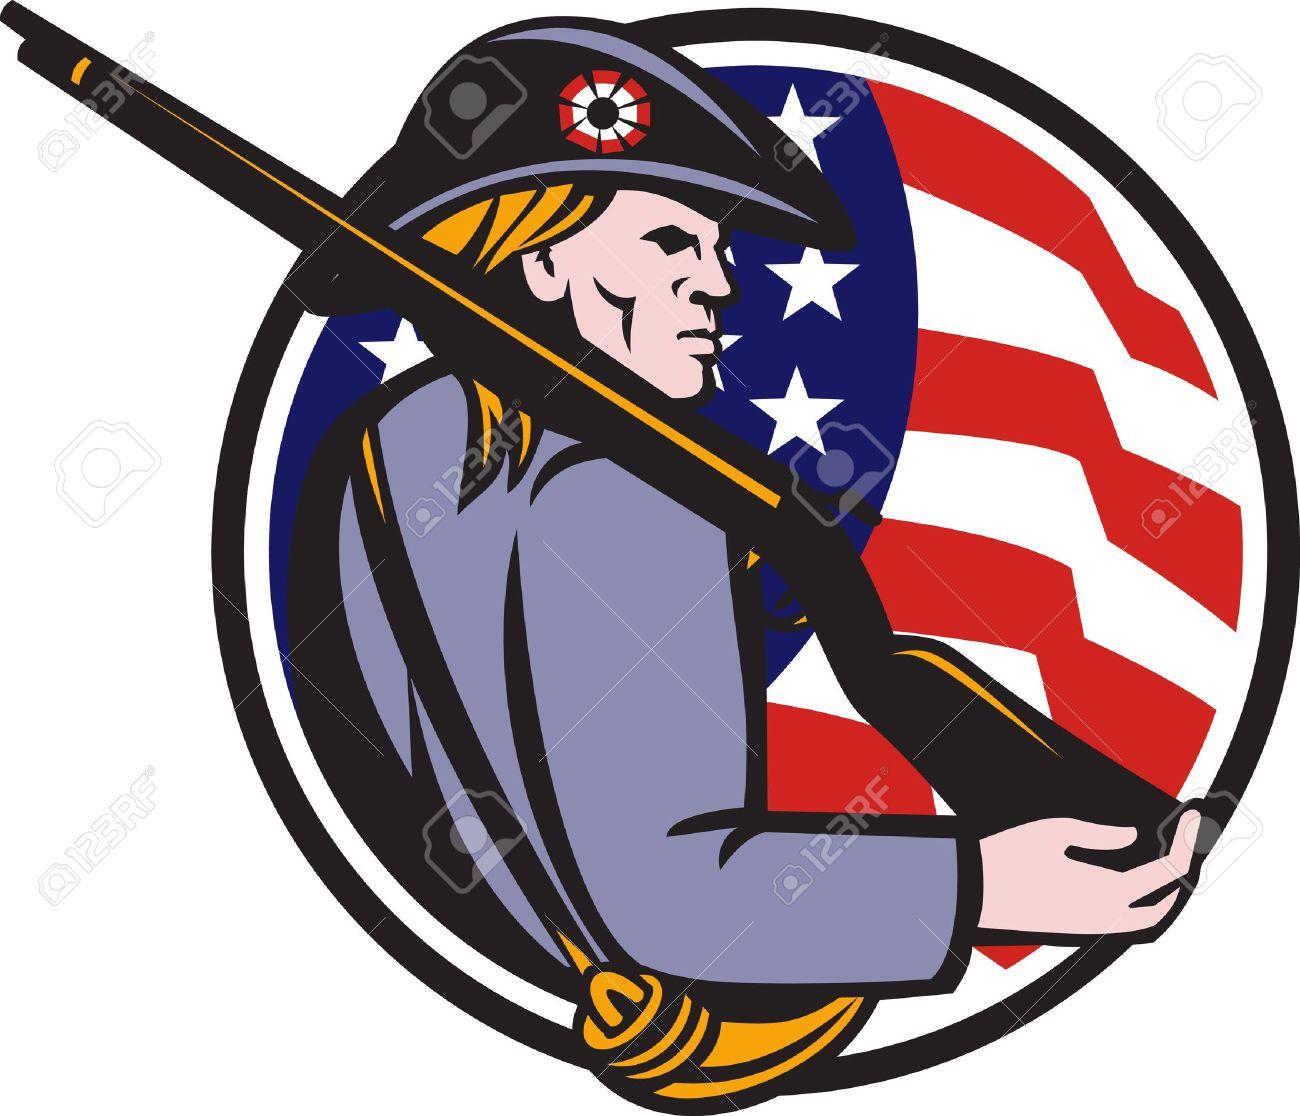 81 minuteman stock illustrations cliparts and royalty free rh 123rf com National Guard Minuteman Clip Art minutemen clipart